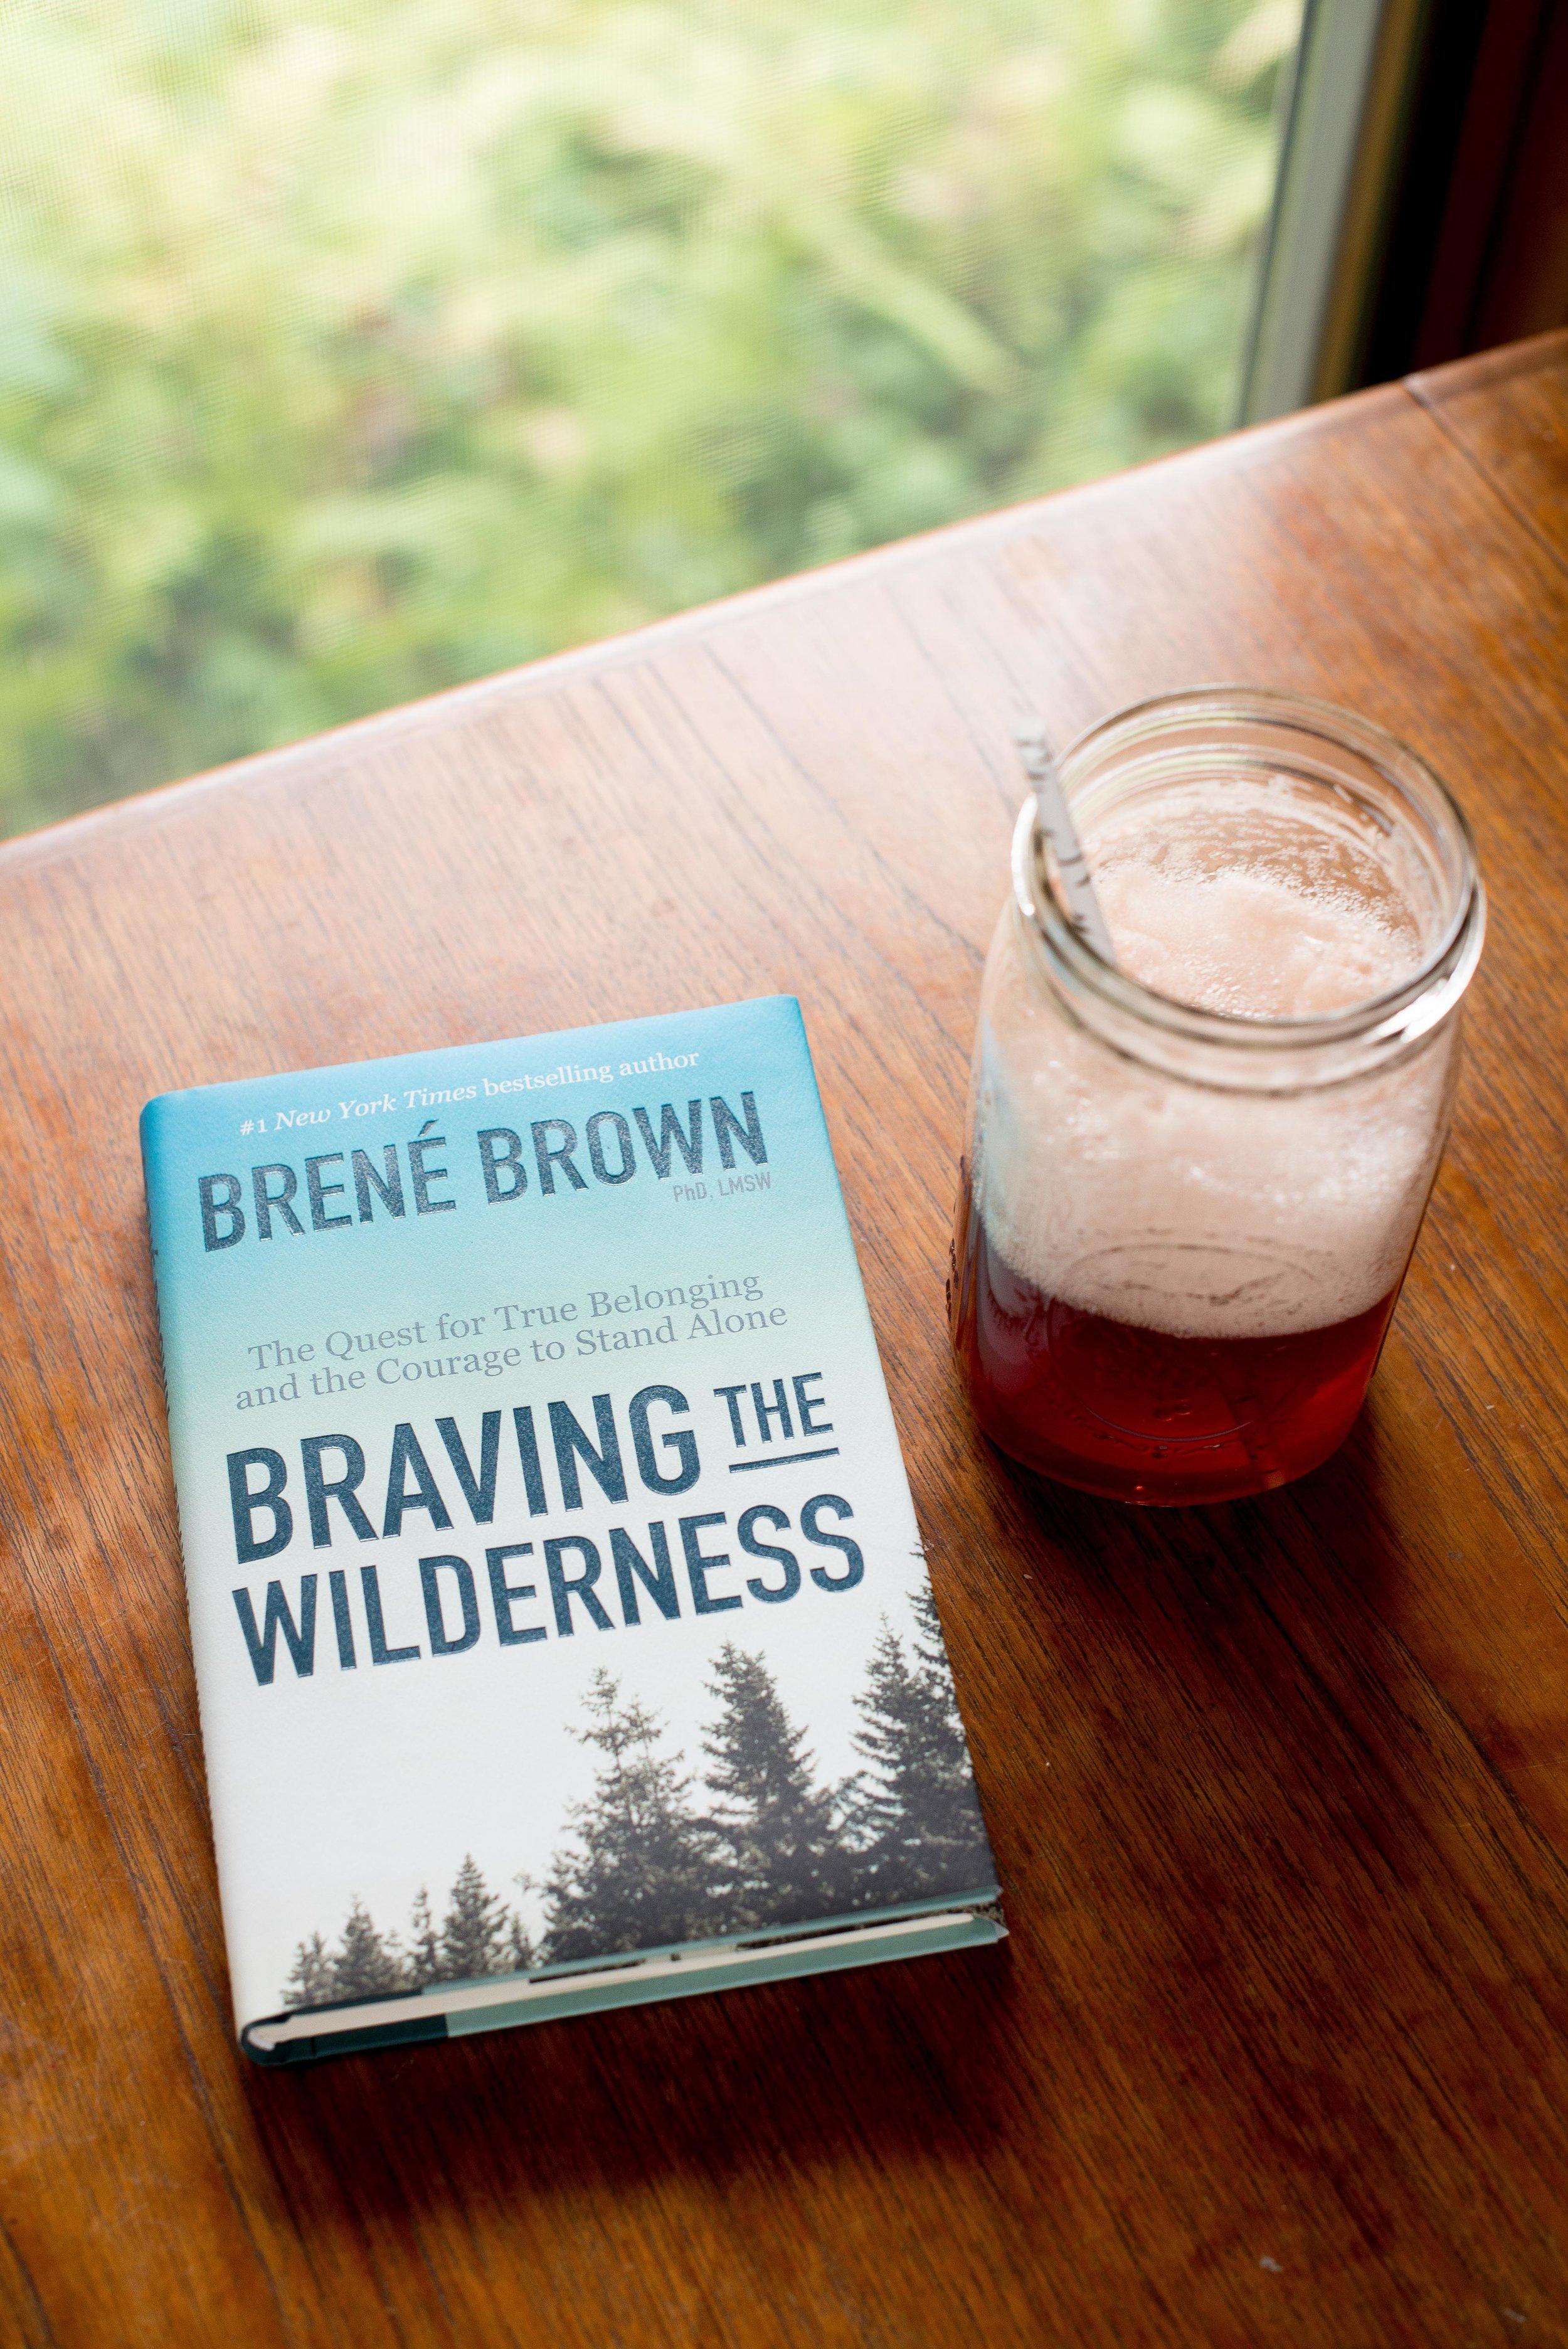 Brene Brown - Braving the Wilderness